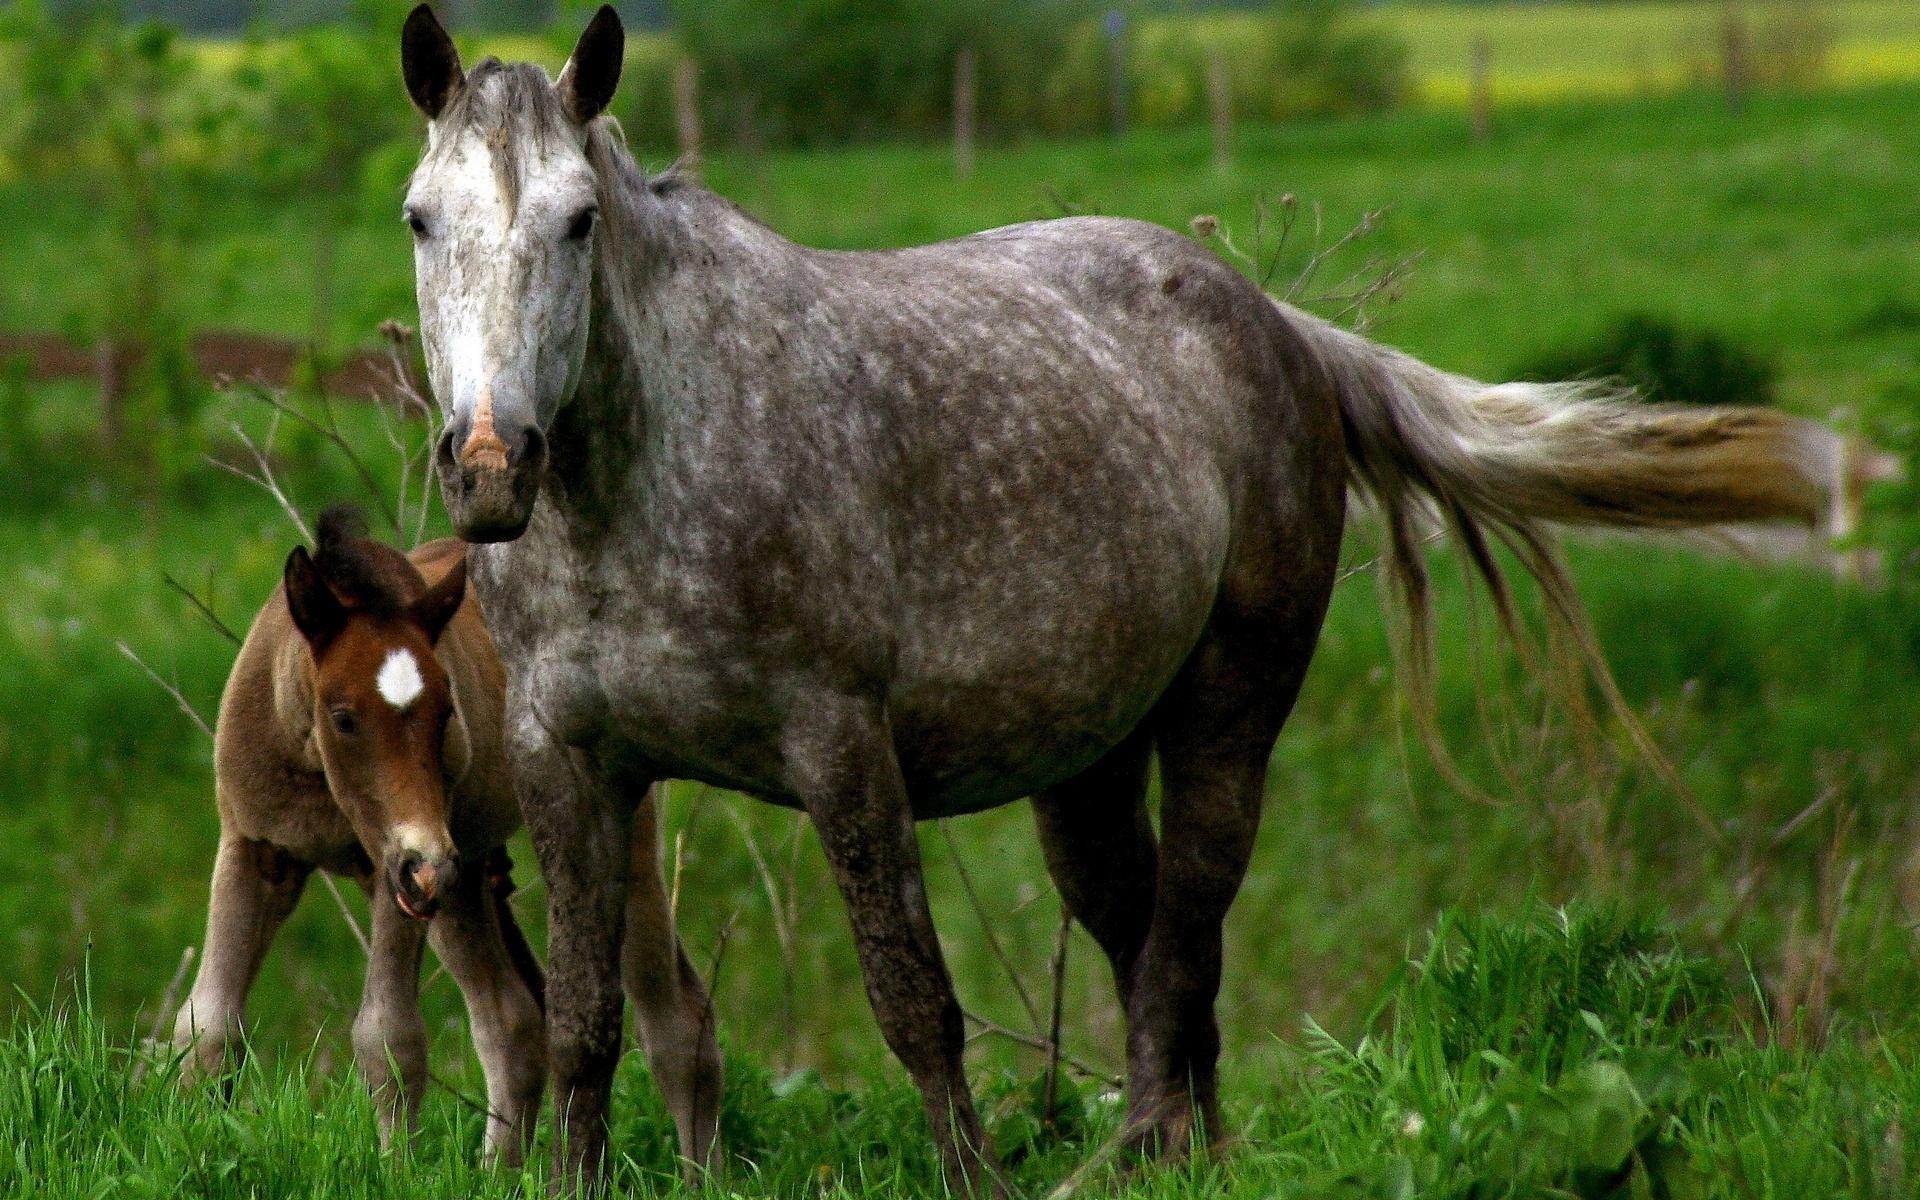 Картинки Лошадь, жеребец, детеныш, пара, уход, трава фото и обои на рабочий стол